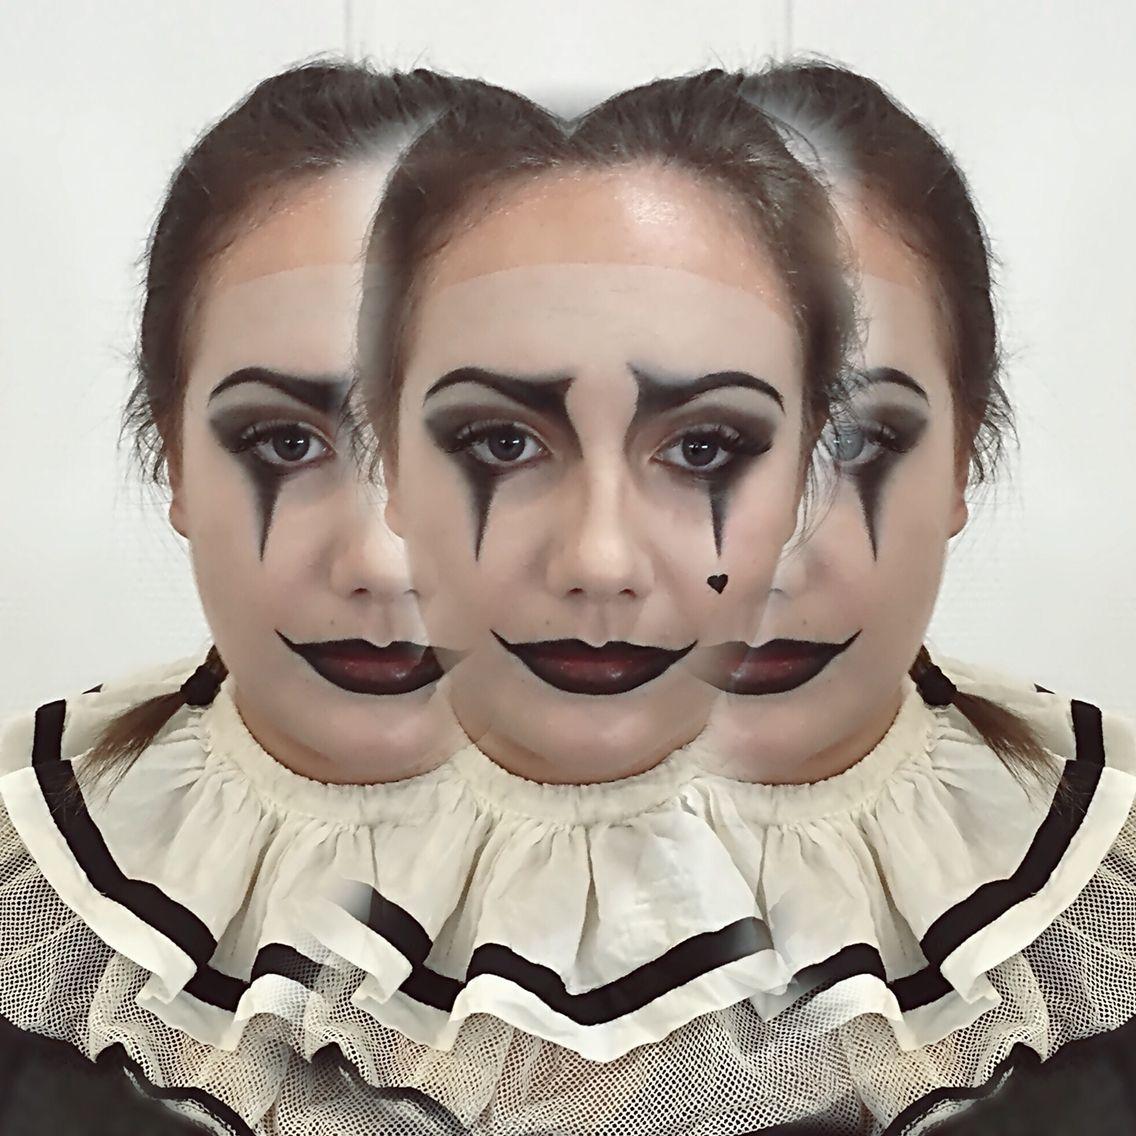 clown makeup by me